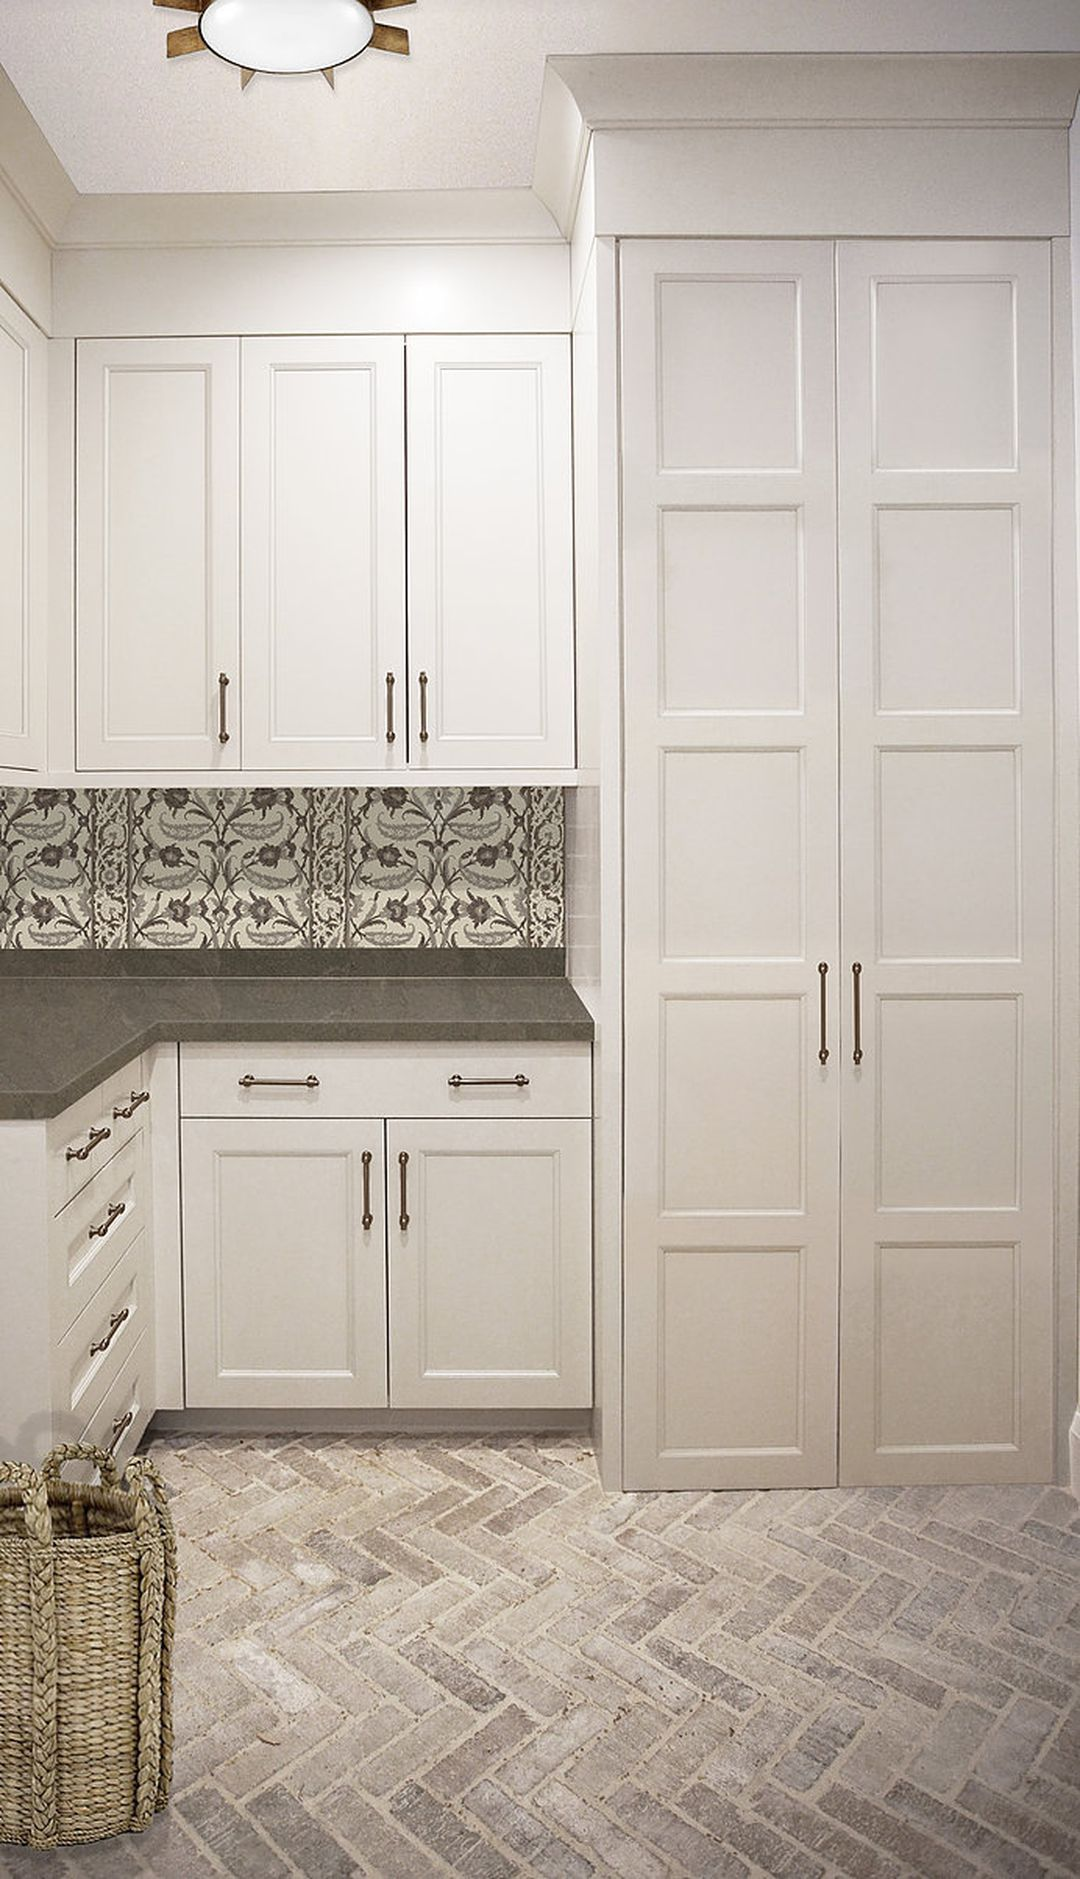 Beautiful Laundry Room Tile Design Ideas 22